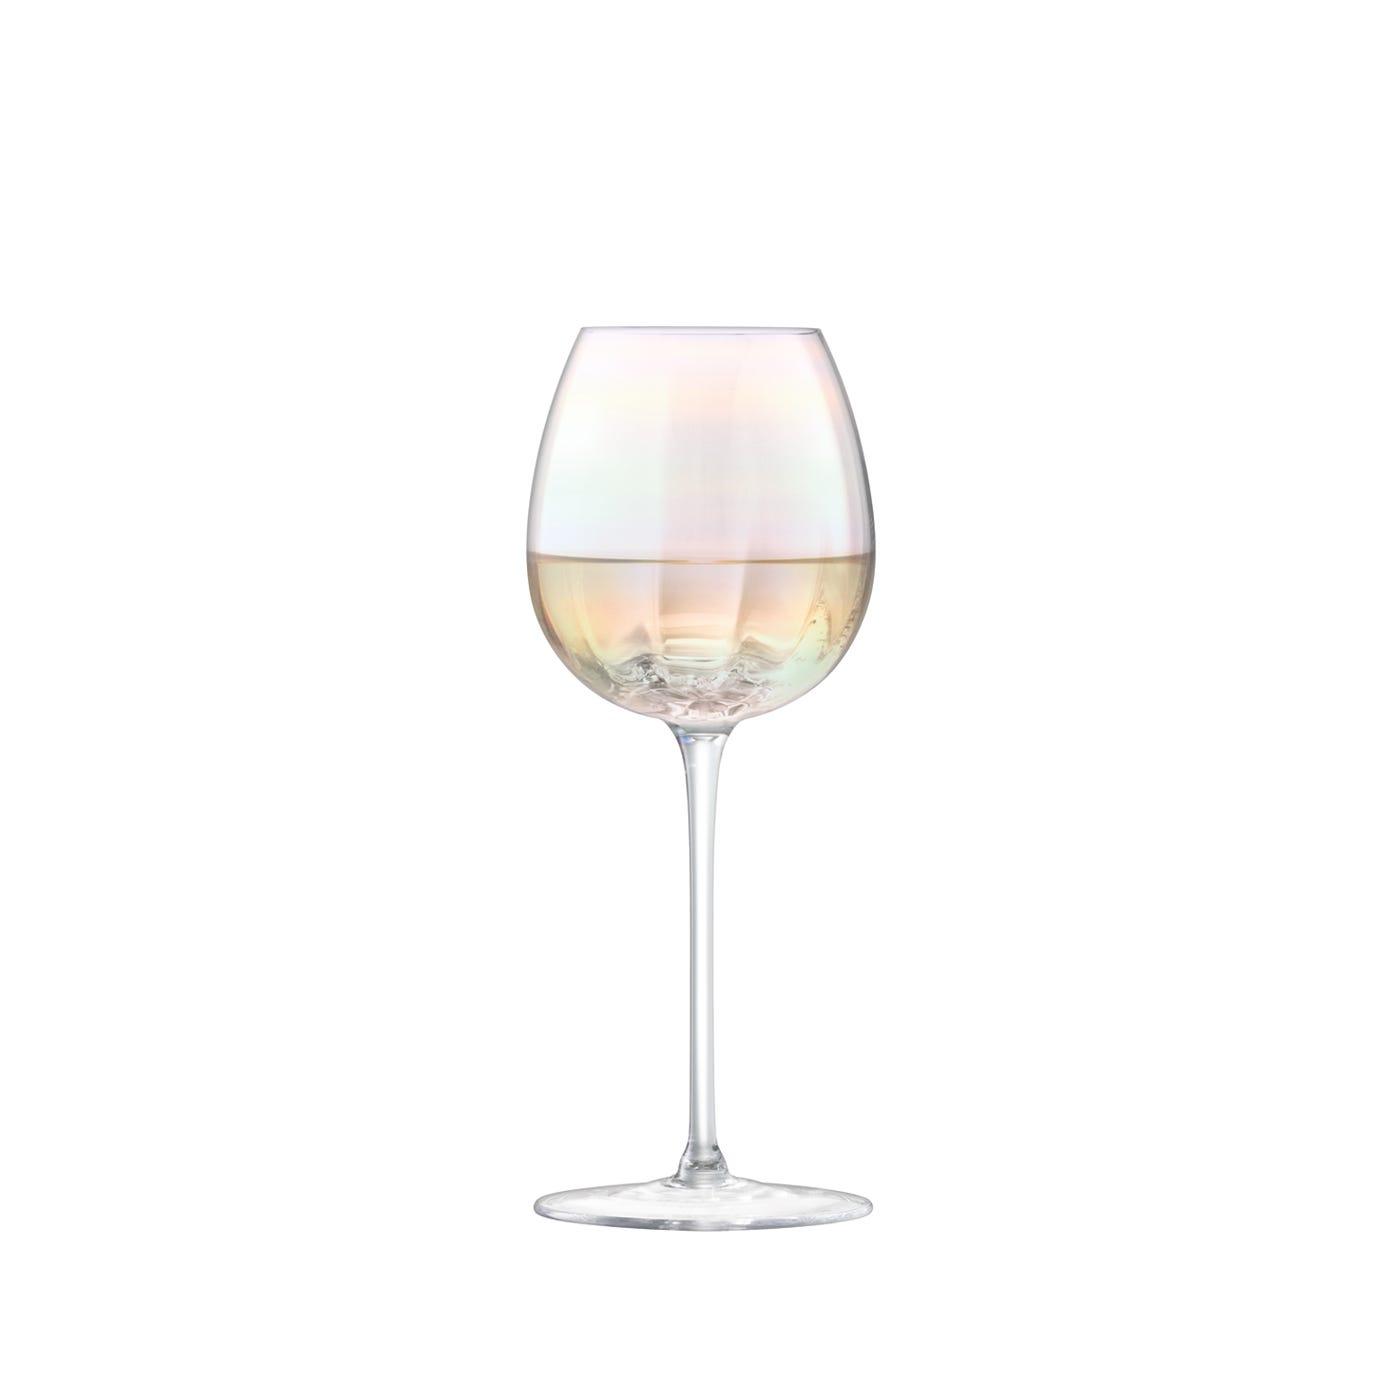 Lsa international pearl white wine glass set of 4 heal s - Beaker wine glasses ...